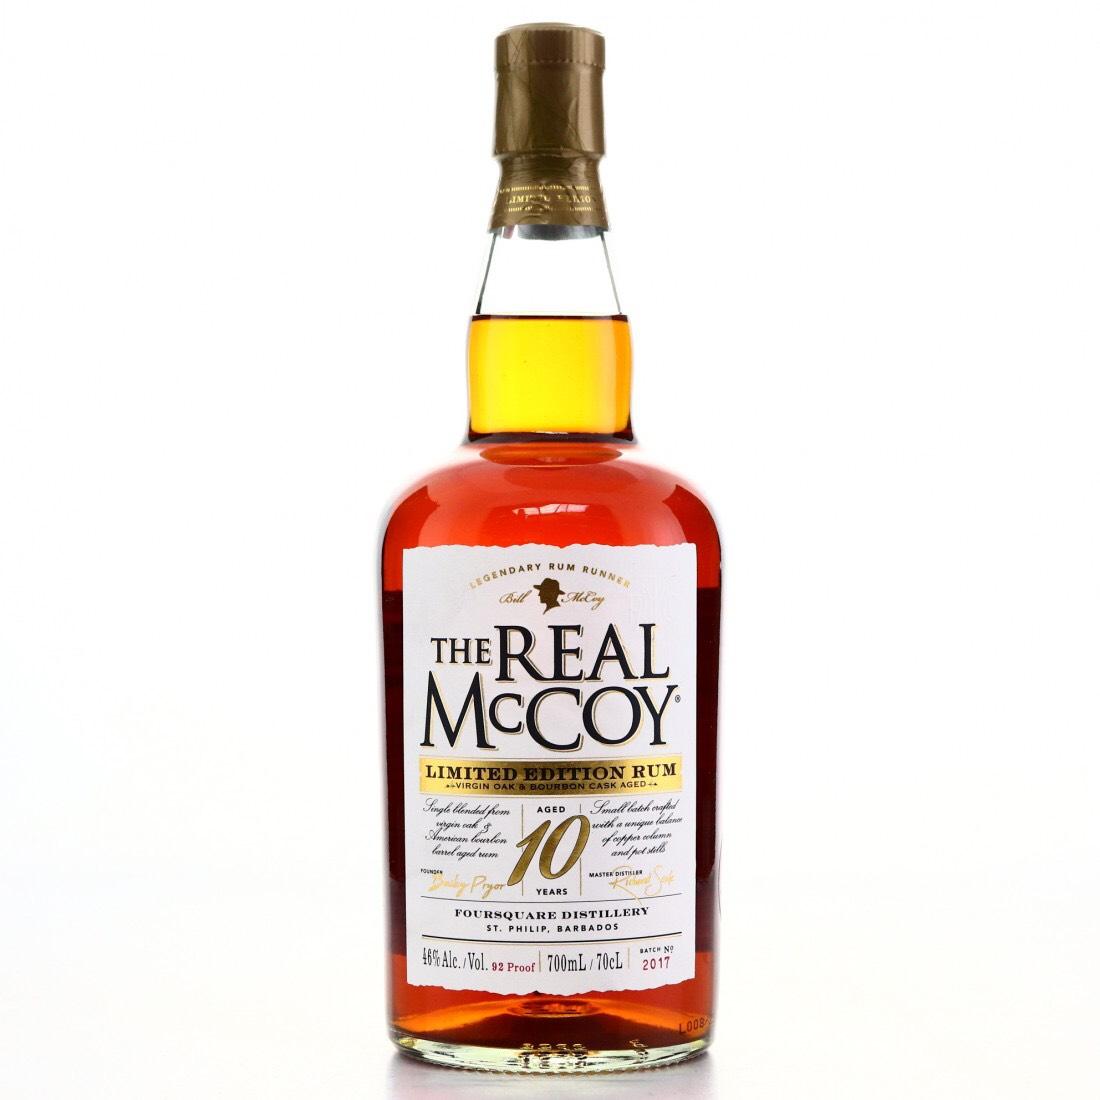 Bottle image of The Real McCoy Limited Edition Rum (Virgin Oak)